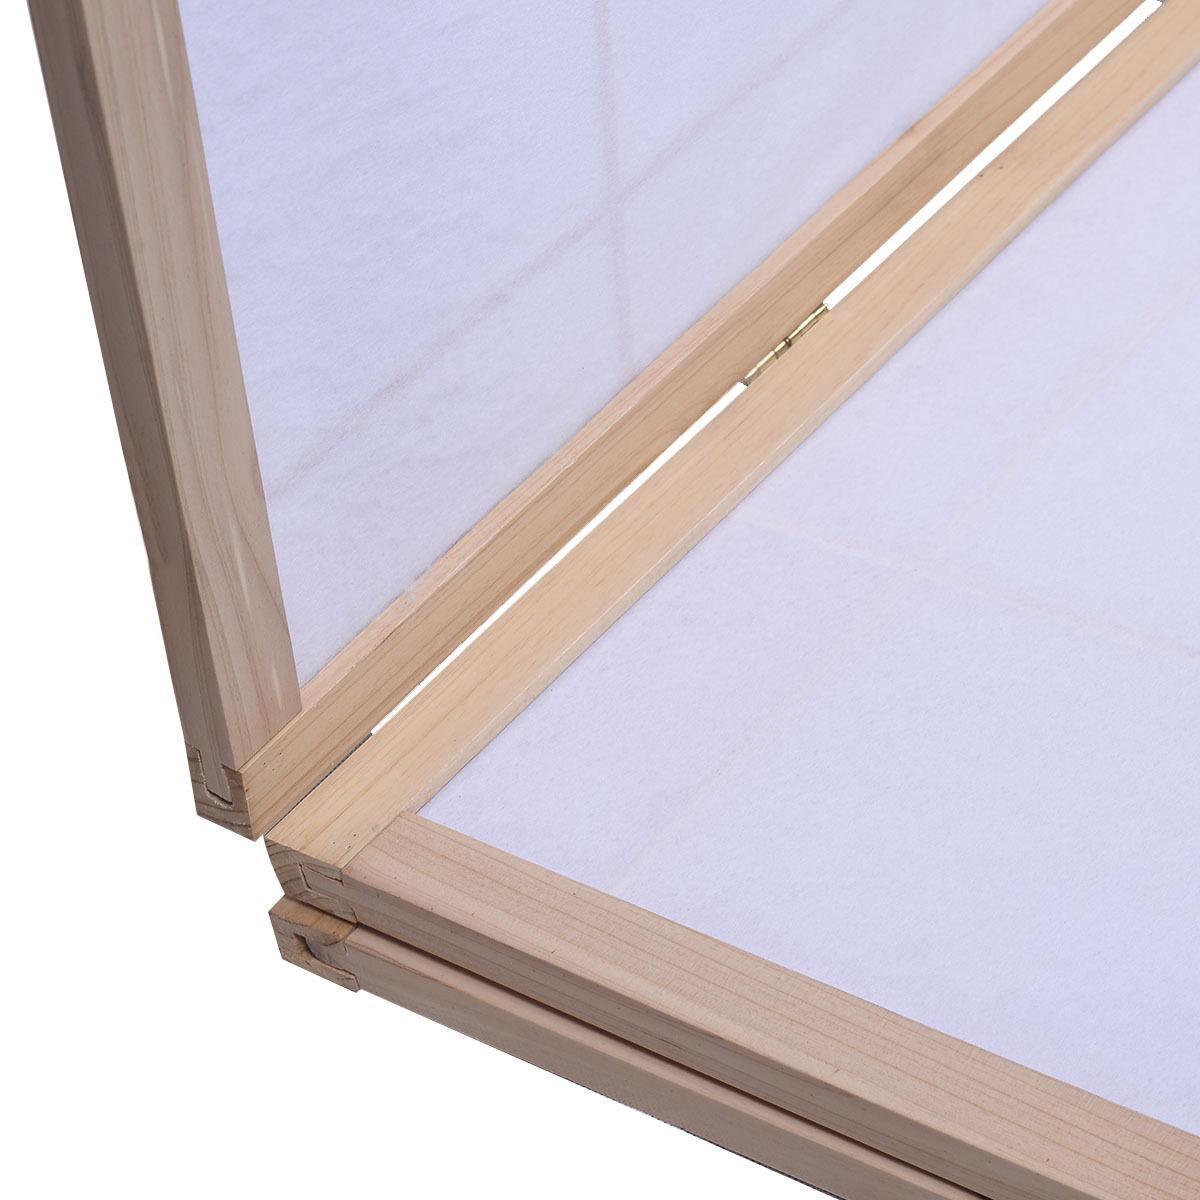 3 Panels Printing Flower Solid Wood Room Screen-Natrual